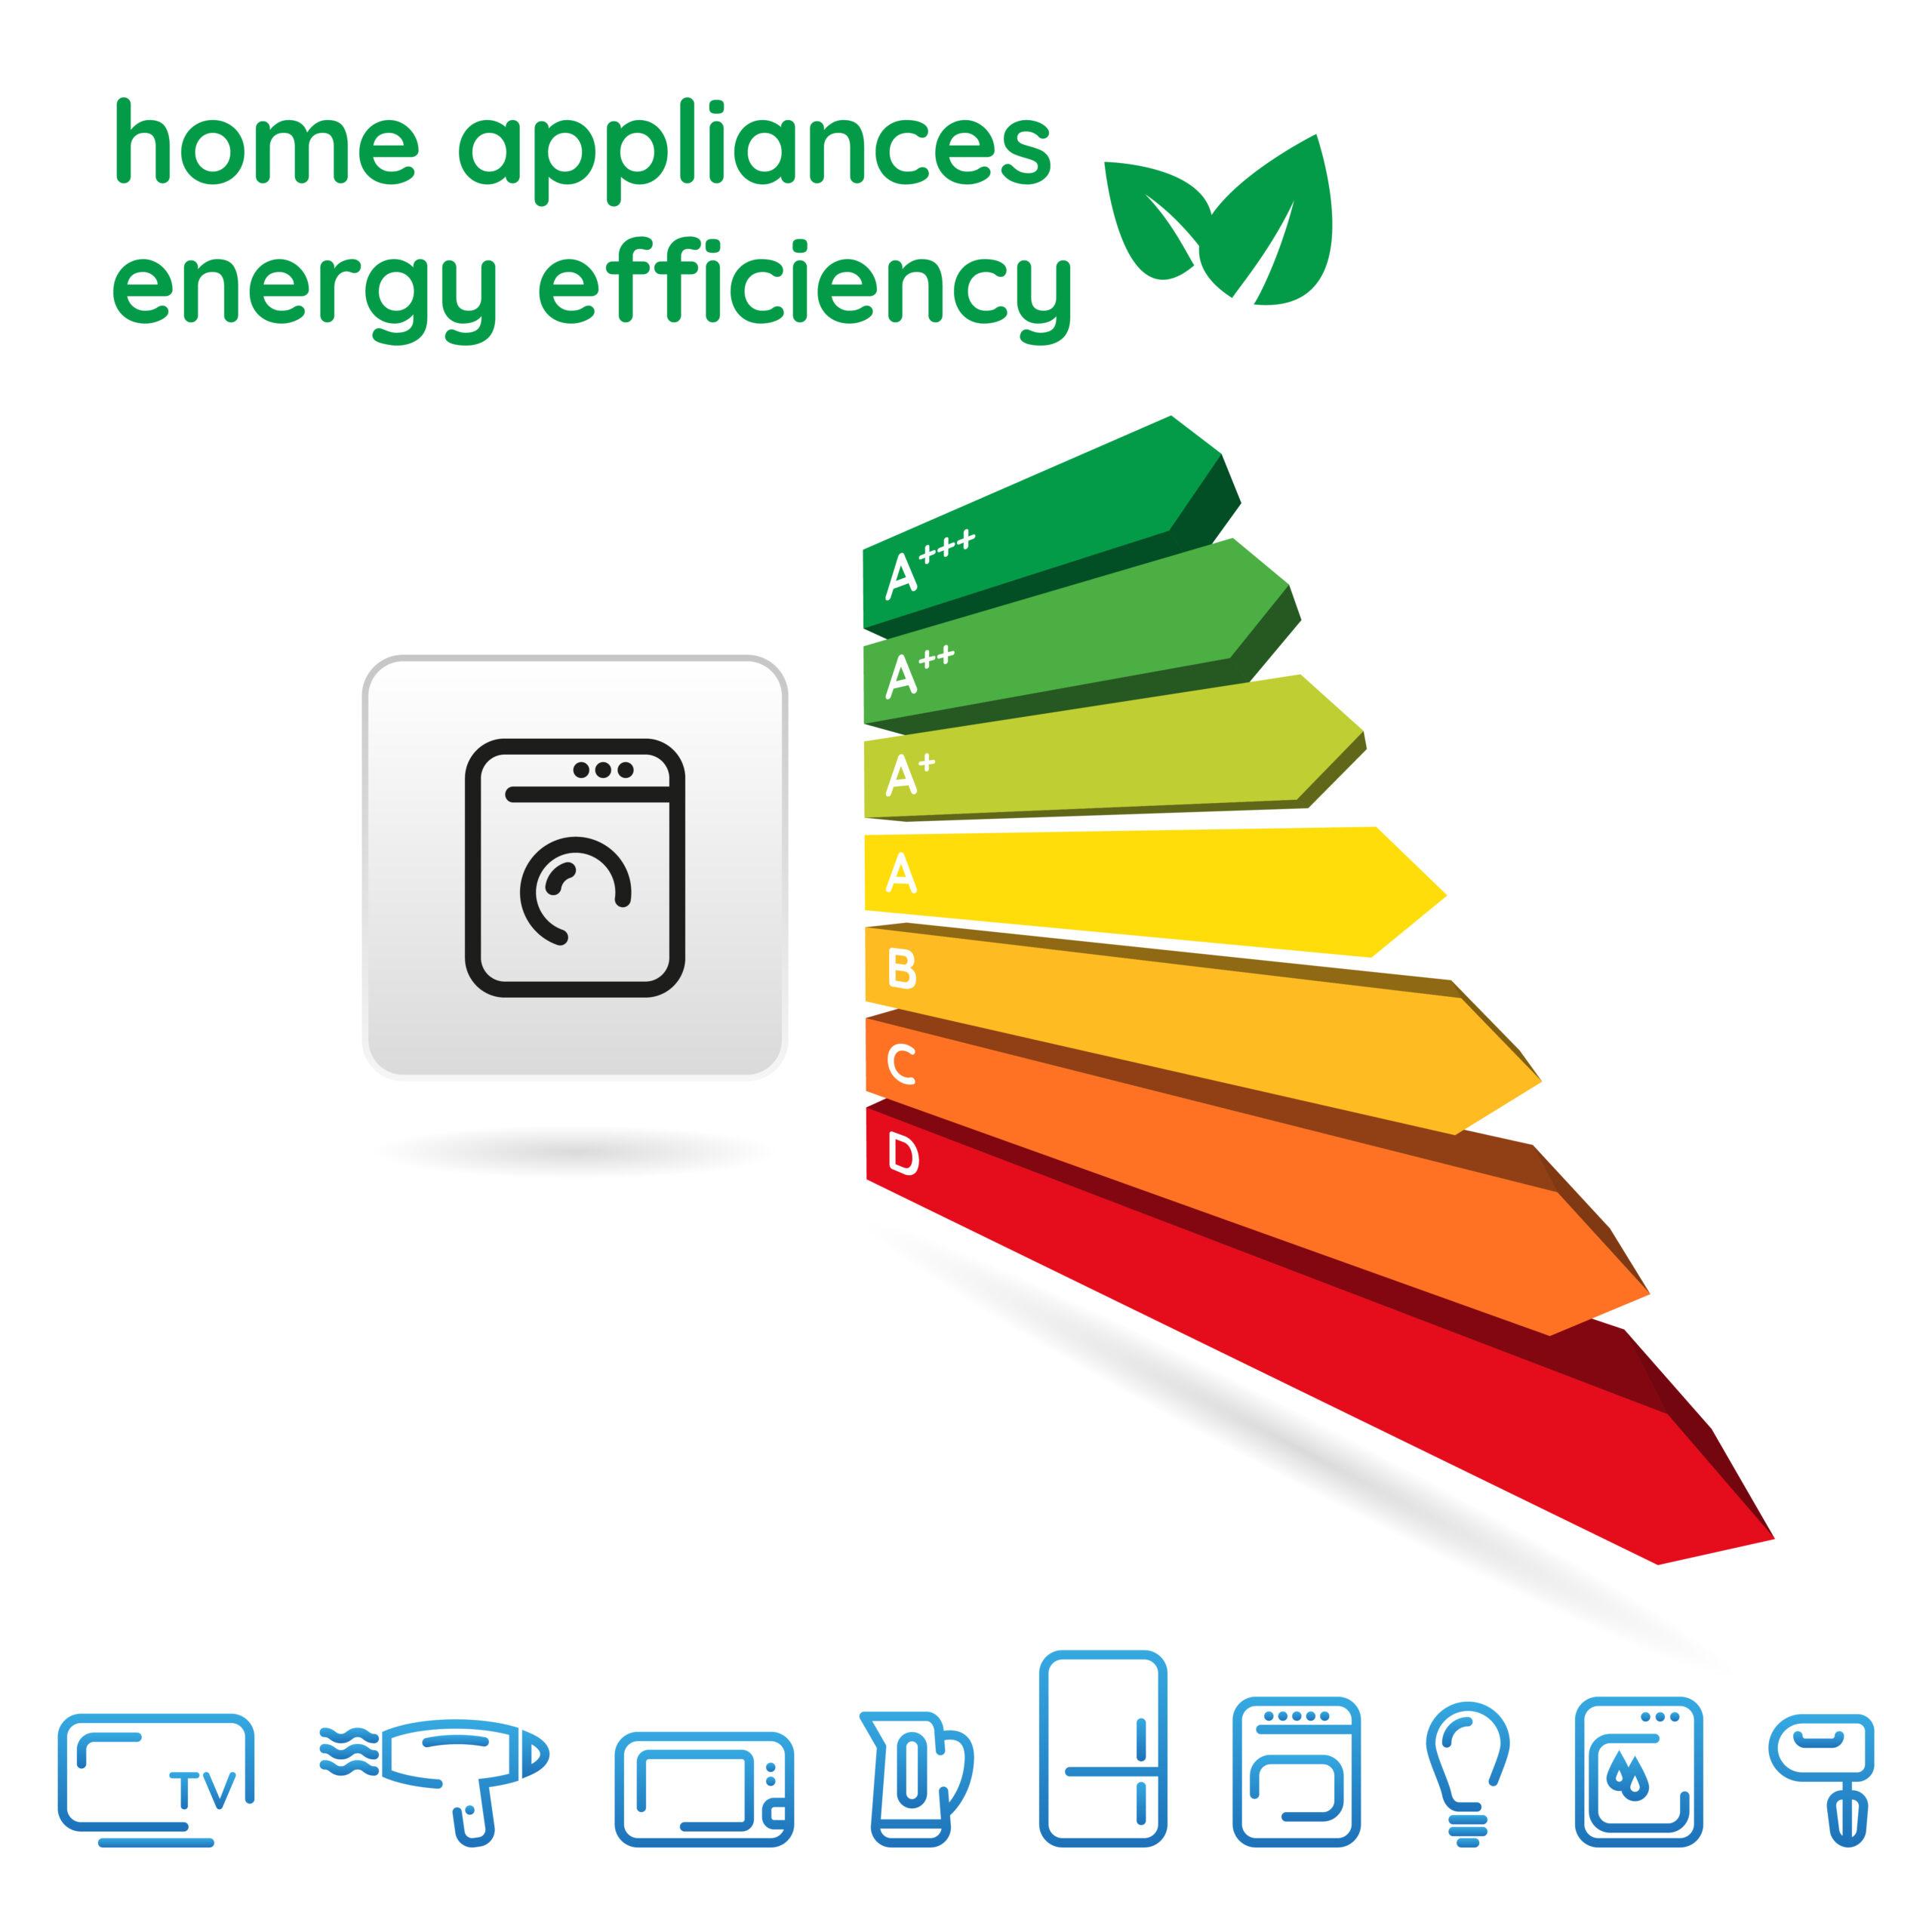 eco-friendly home appliances